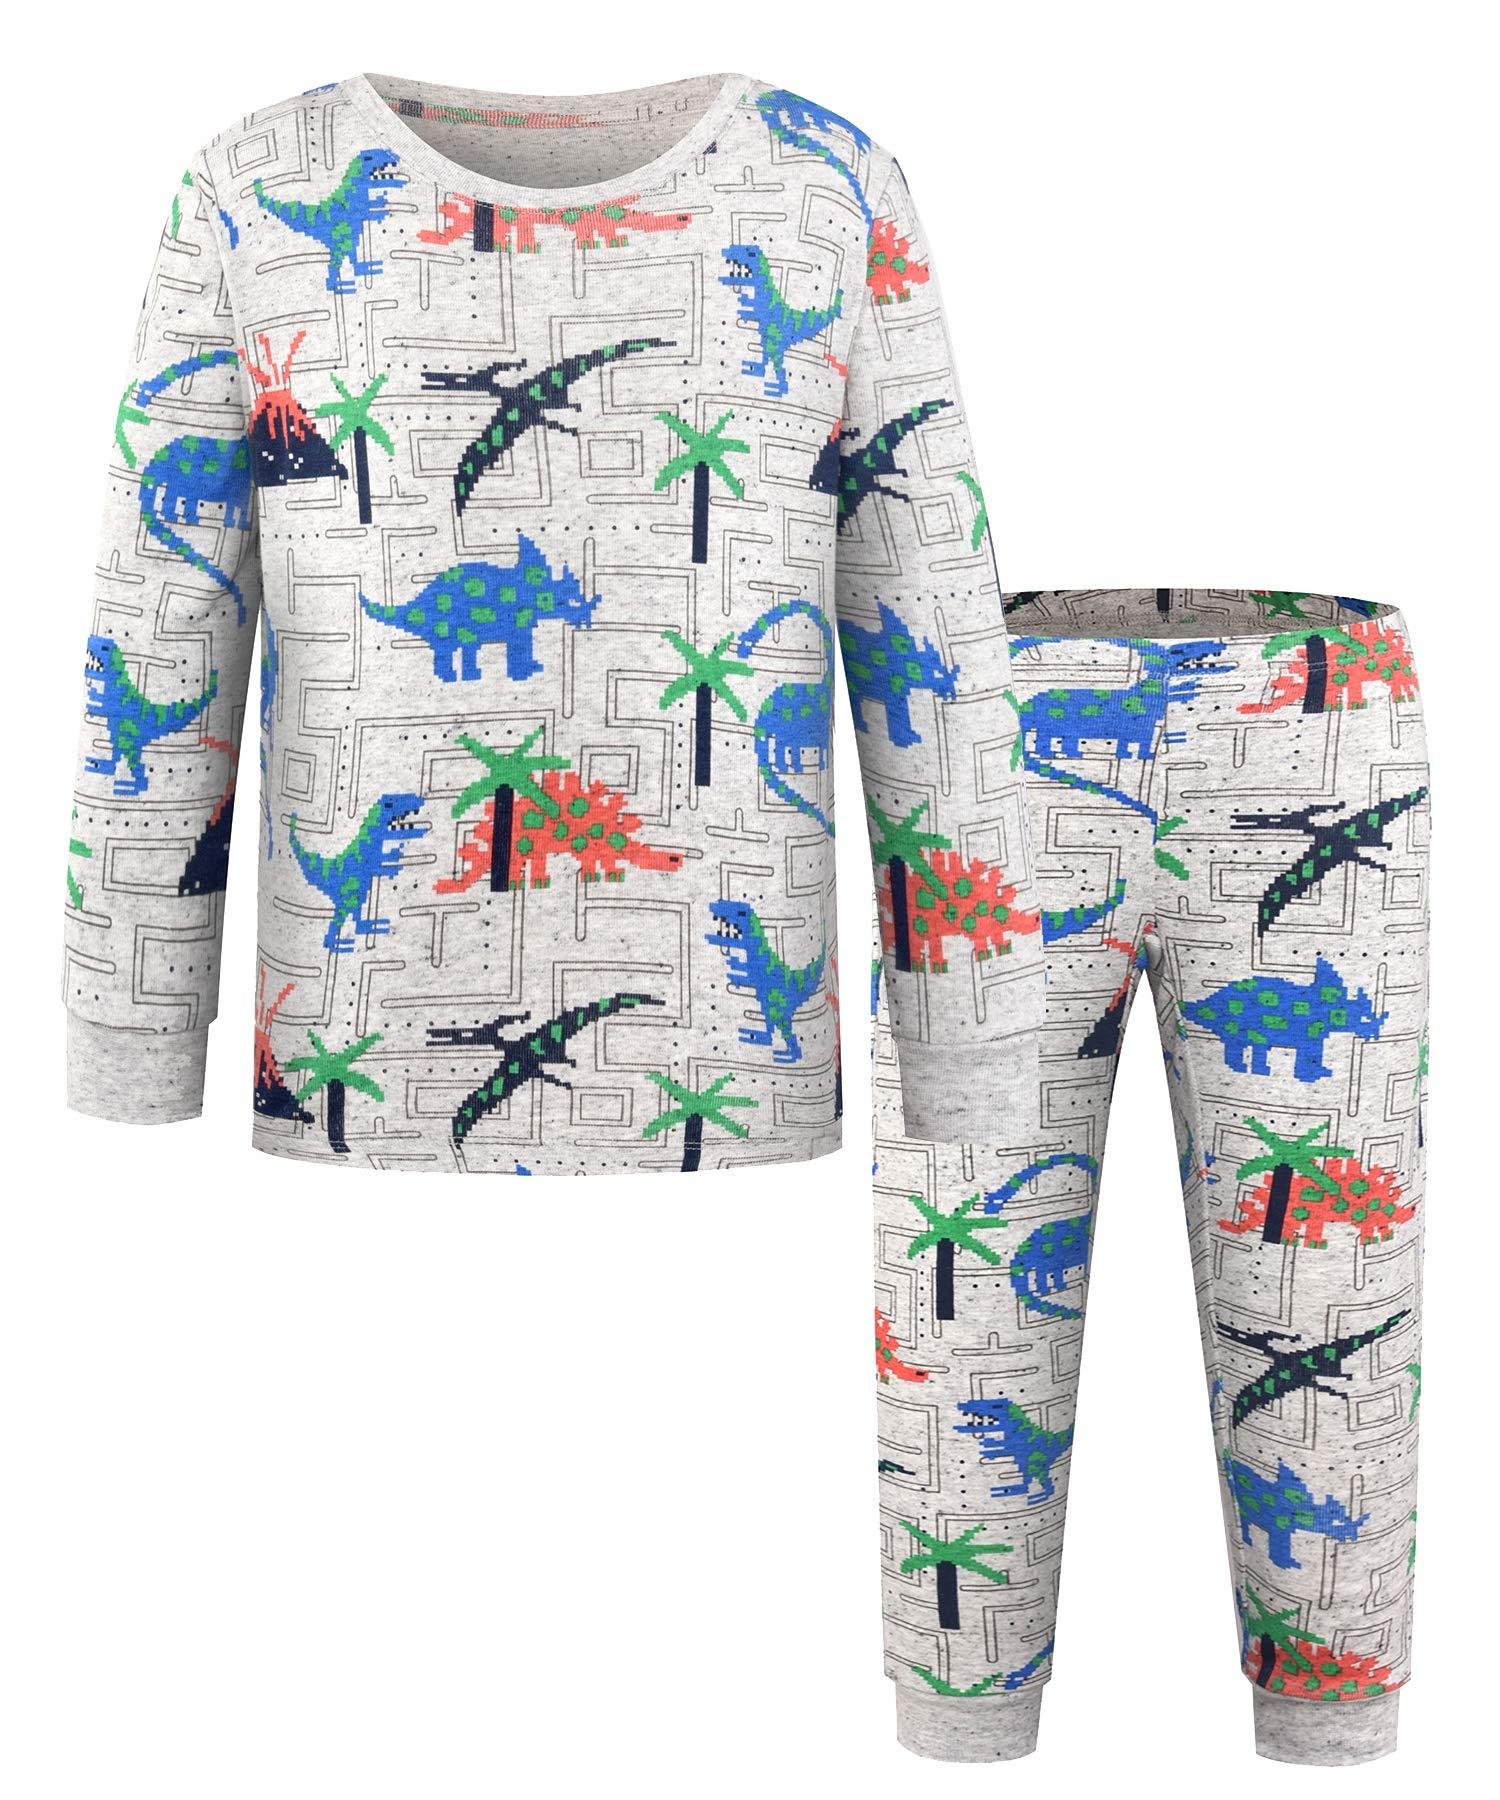 DAWILS Boys Pajamas Set Little Boys Dinosaurs Pjs Toddler 100% Cotton Sleepwear 2 Piece Kids Nightwear Gray Children Clothes 3Years